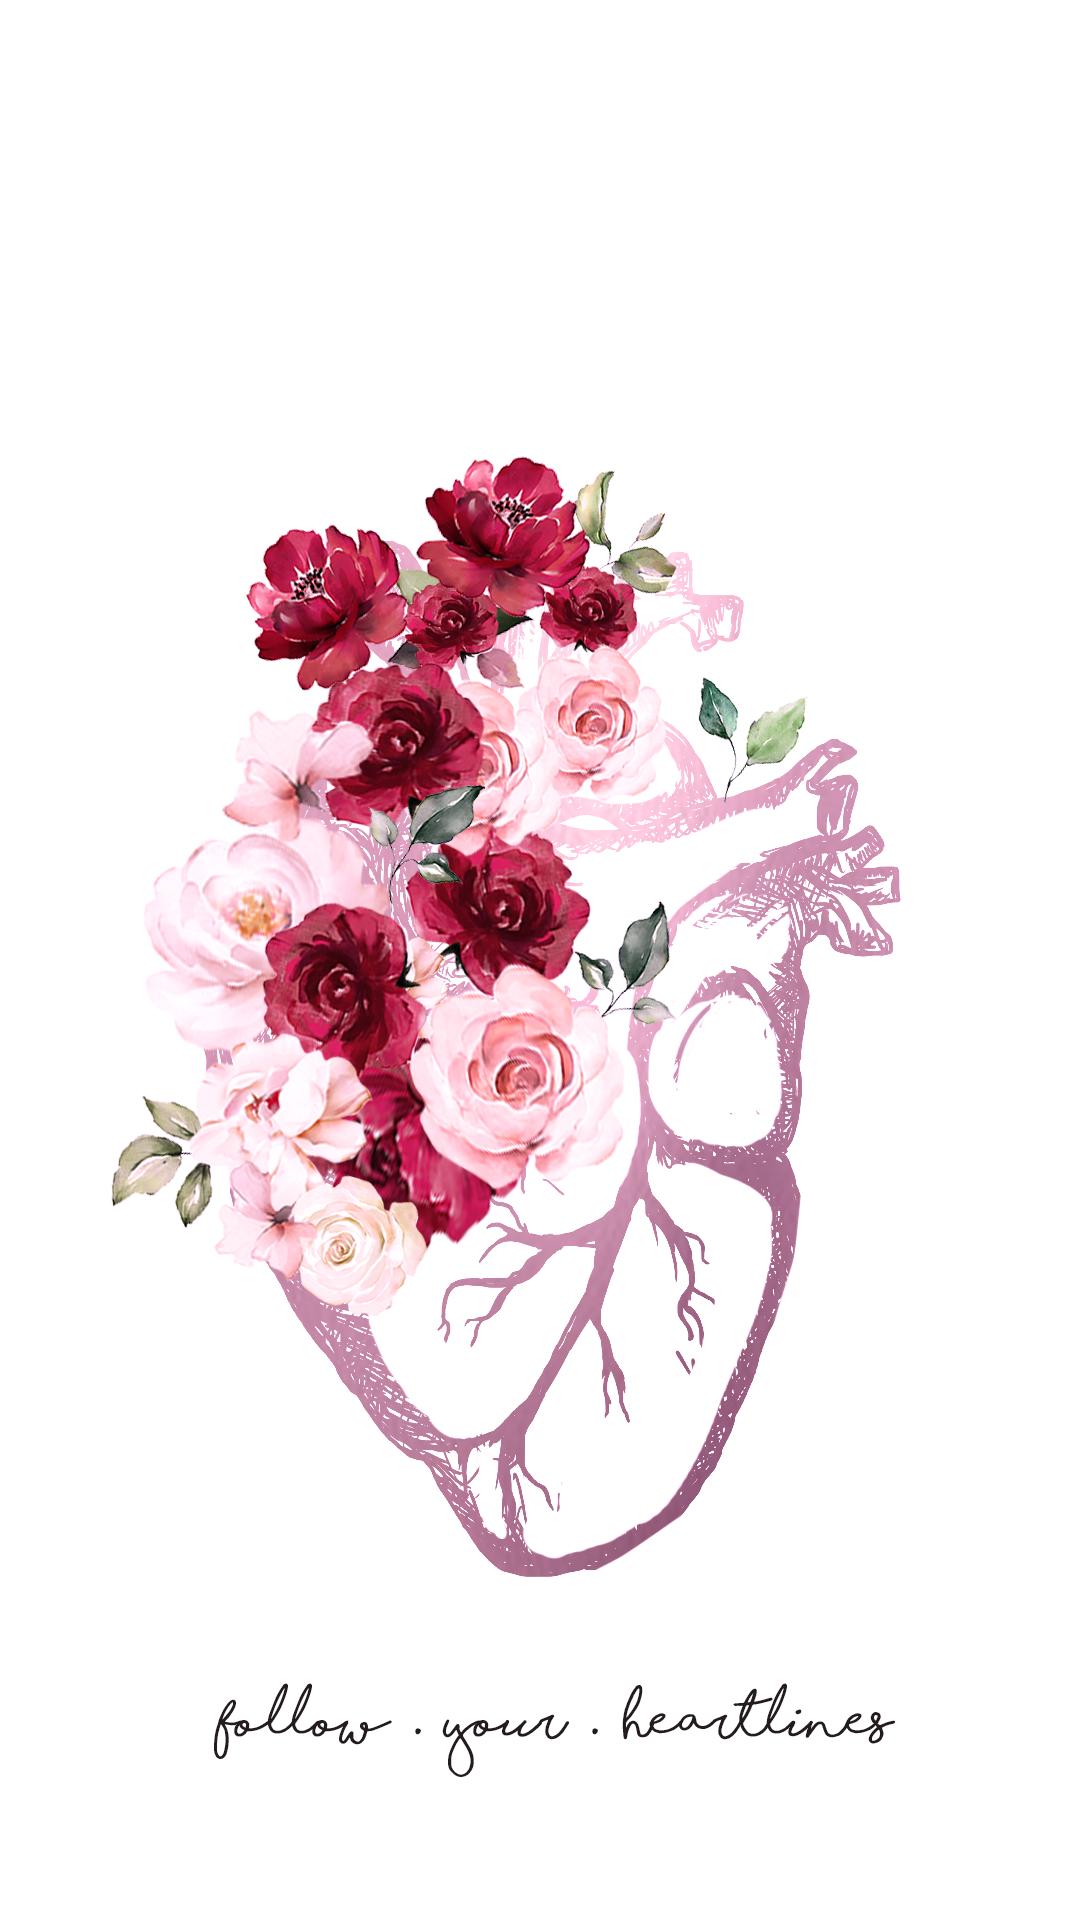 Wallpaper Coração de Flores 4 by Gocase, flowers, flores, rosas, vermelho, red, roses, pink, leaves, folhas, árvores, raízes, trees, roots, nature, follow your heartlines, follow your heart, coração, corações, amor, love, wallpaper, papel de parede, fundo de tela, background, gocase, lovegocase, #wallpaper, #lovegocase, #gocase, #coração, #flores, #rosas, #followyourheart, coração, amor, casal, #wallper, #love